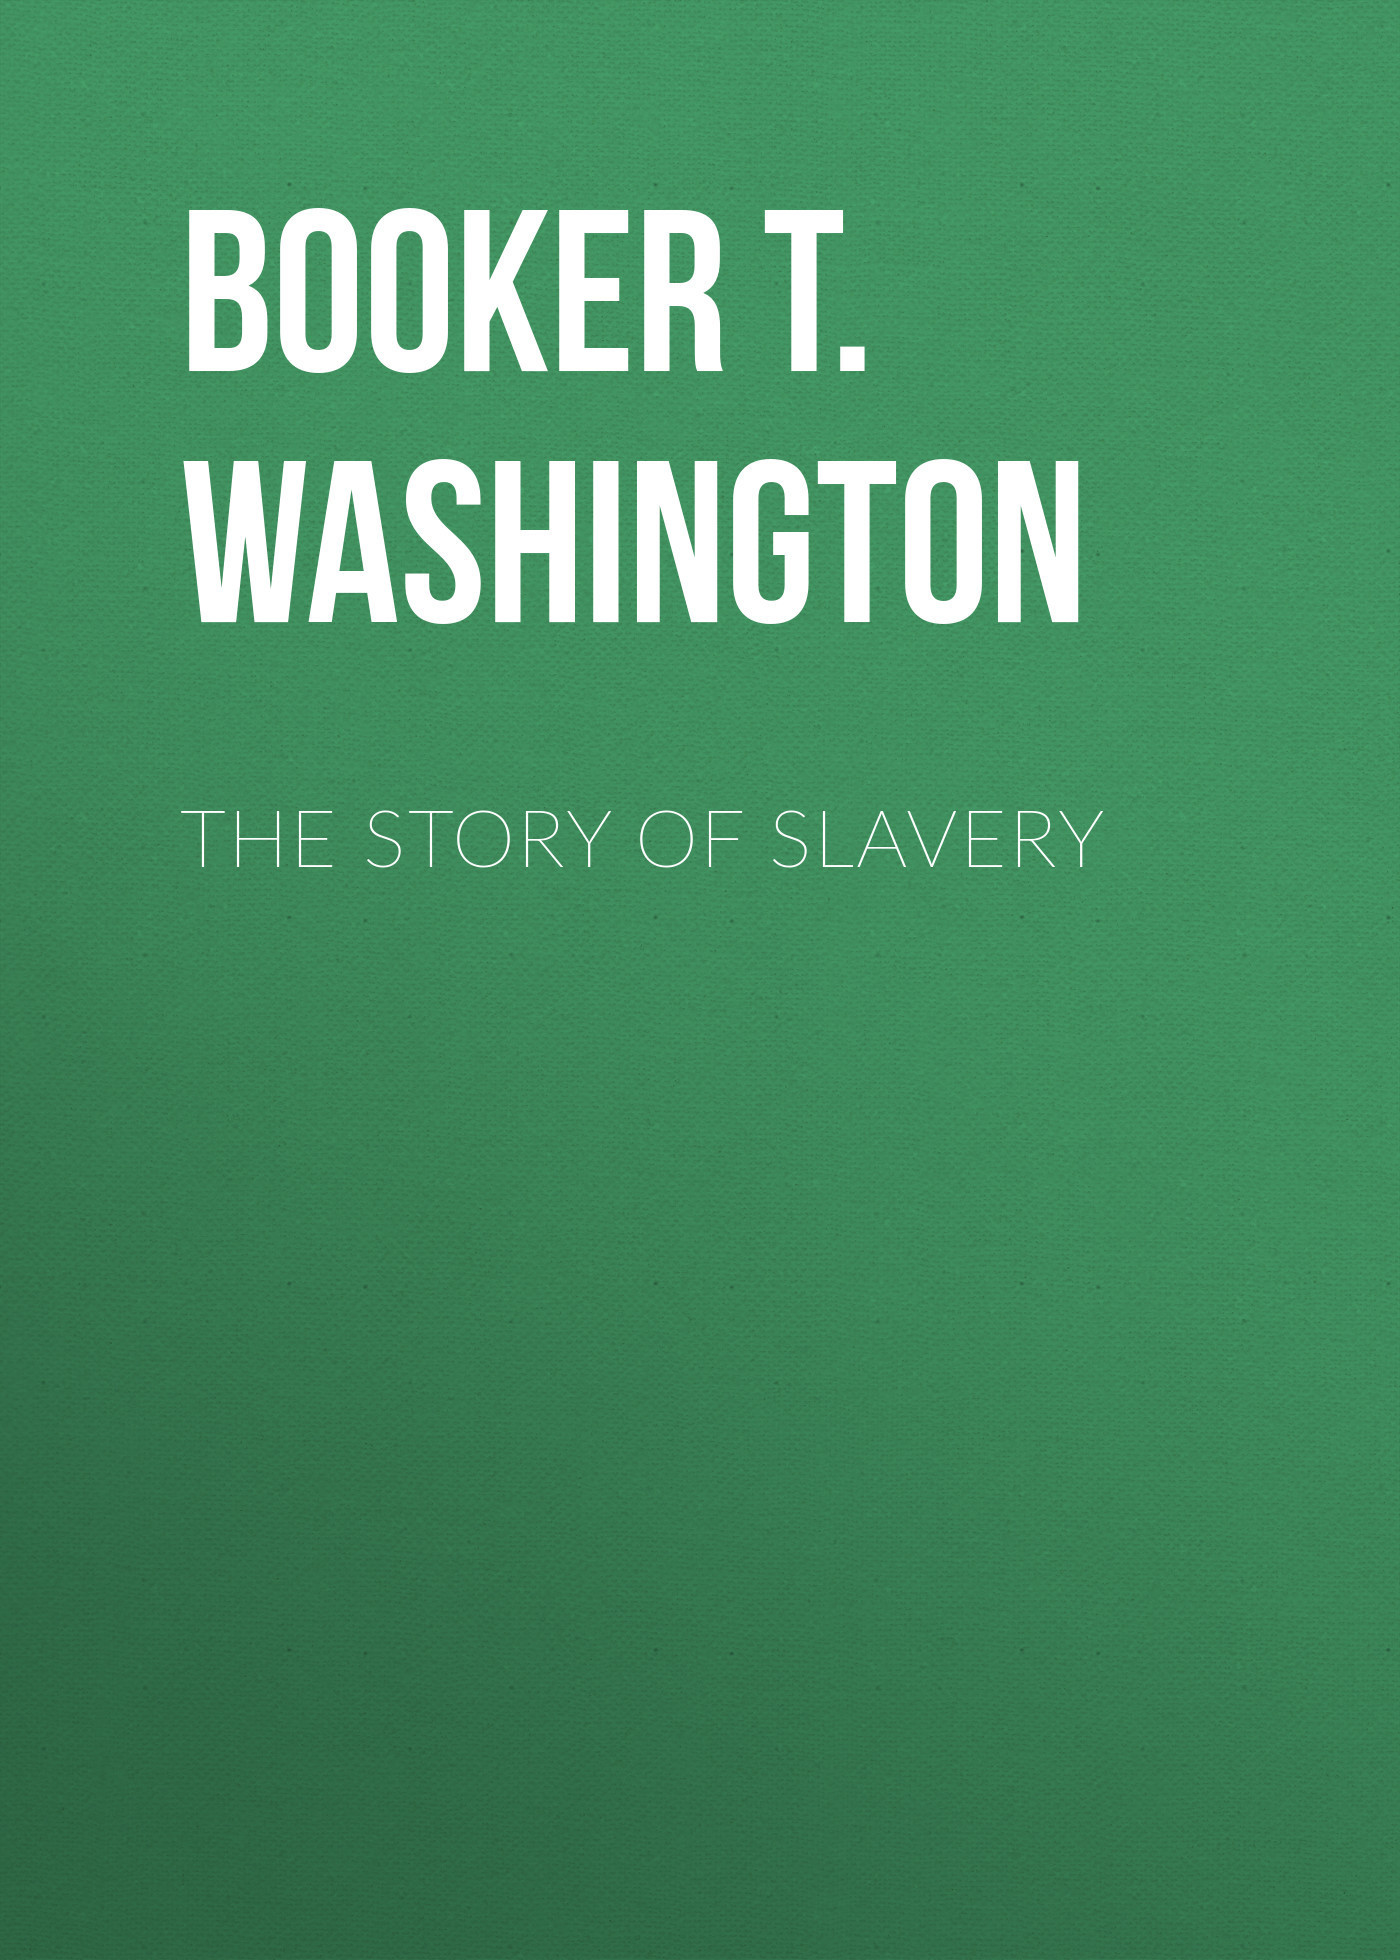 Booker T. Washington The Story of Slavery booker t booker t the mg s the booker t set